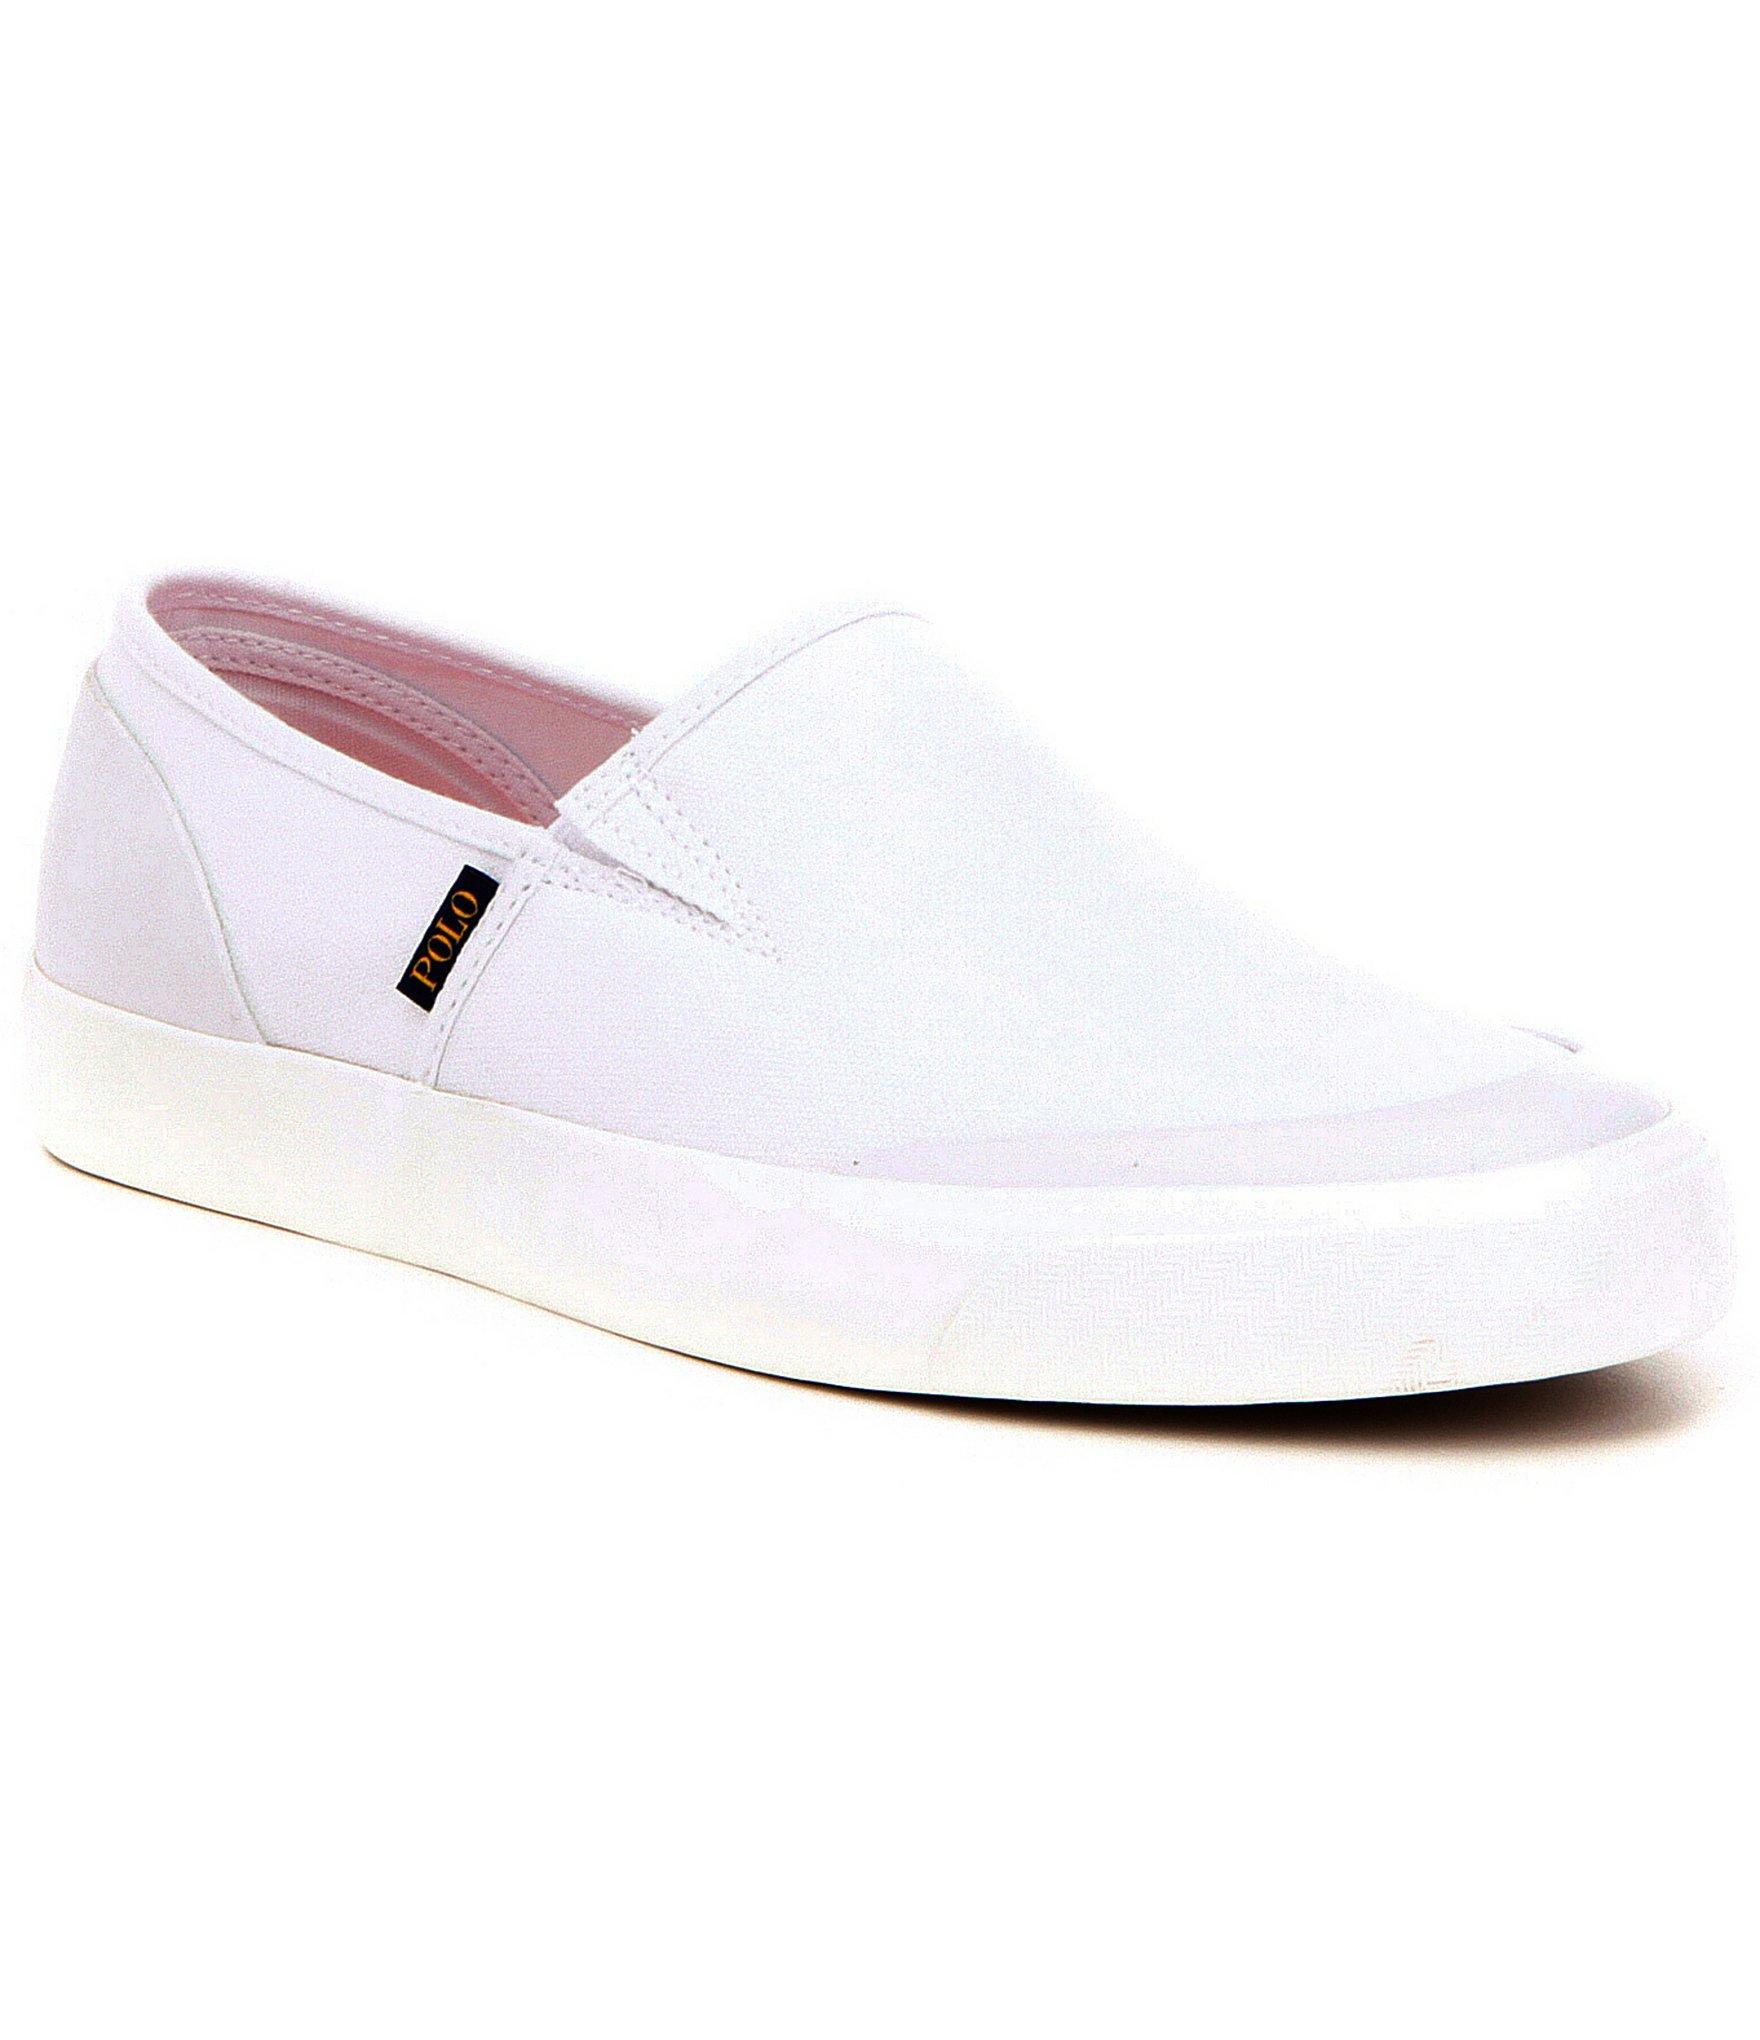 b0e09841b69e rl polo shirts cheap lauren by ralph lauren shoes percy sandals ...